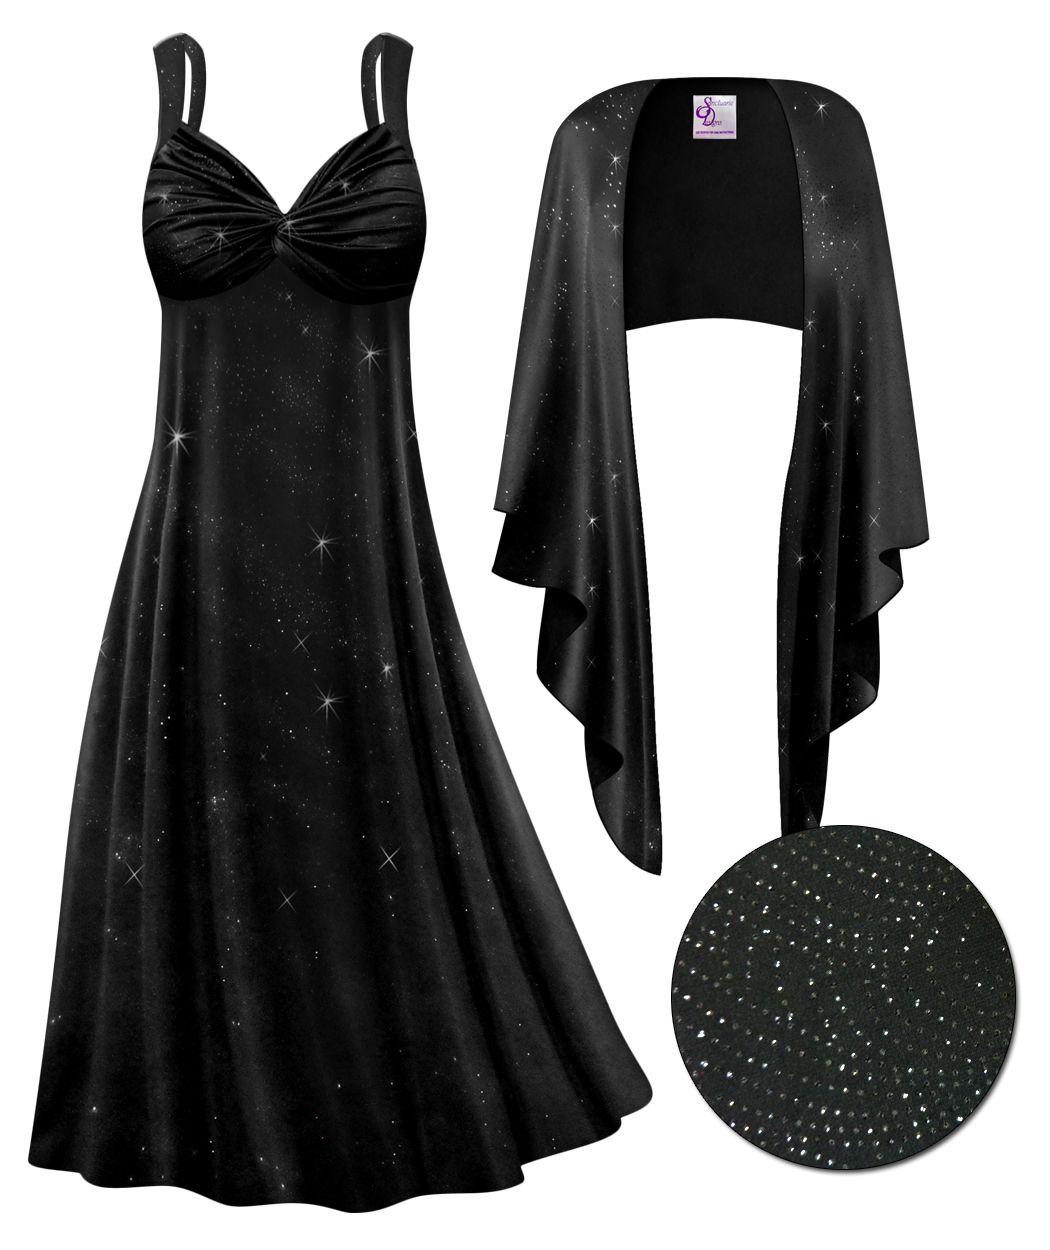 Customizable 2 Piece Black Glittery Lines Slinky Plus Size Supersize